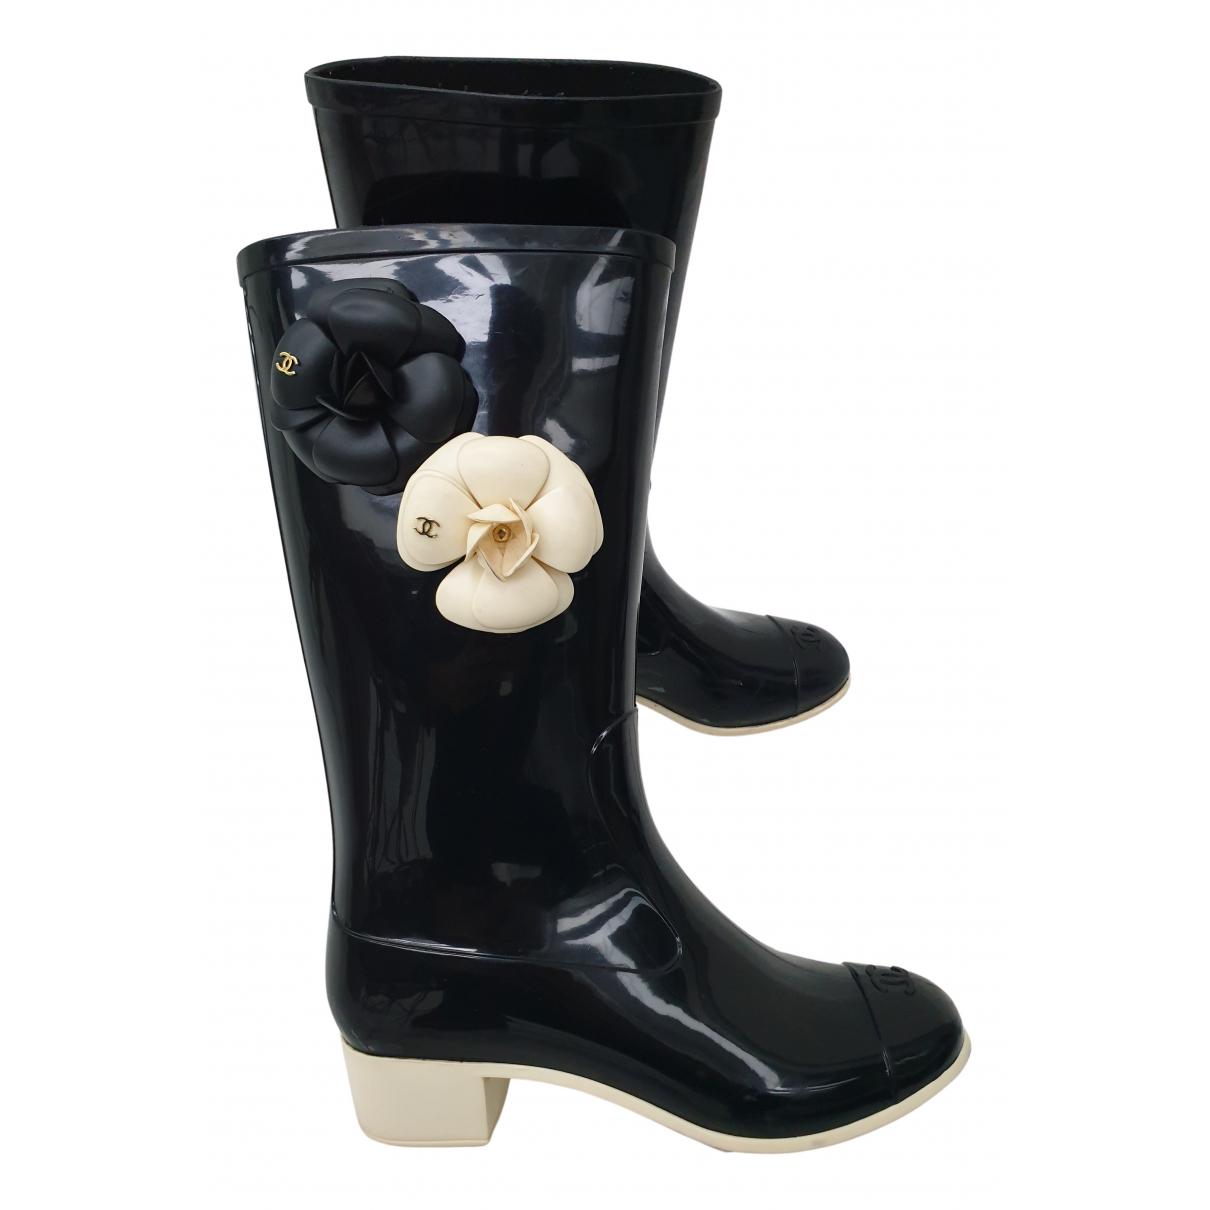 Chanel N Black Boots for Women 37 EU